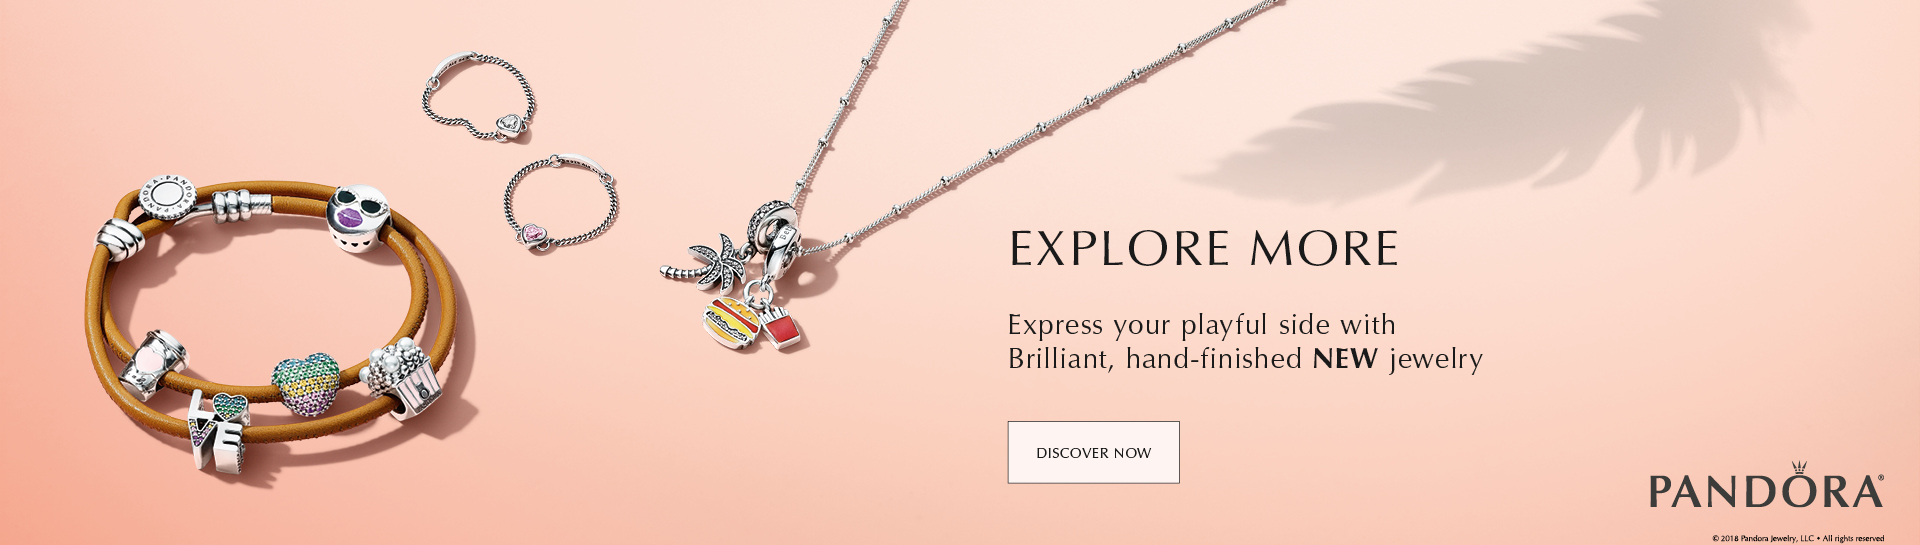 Pandora Explore Summer